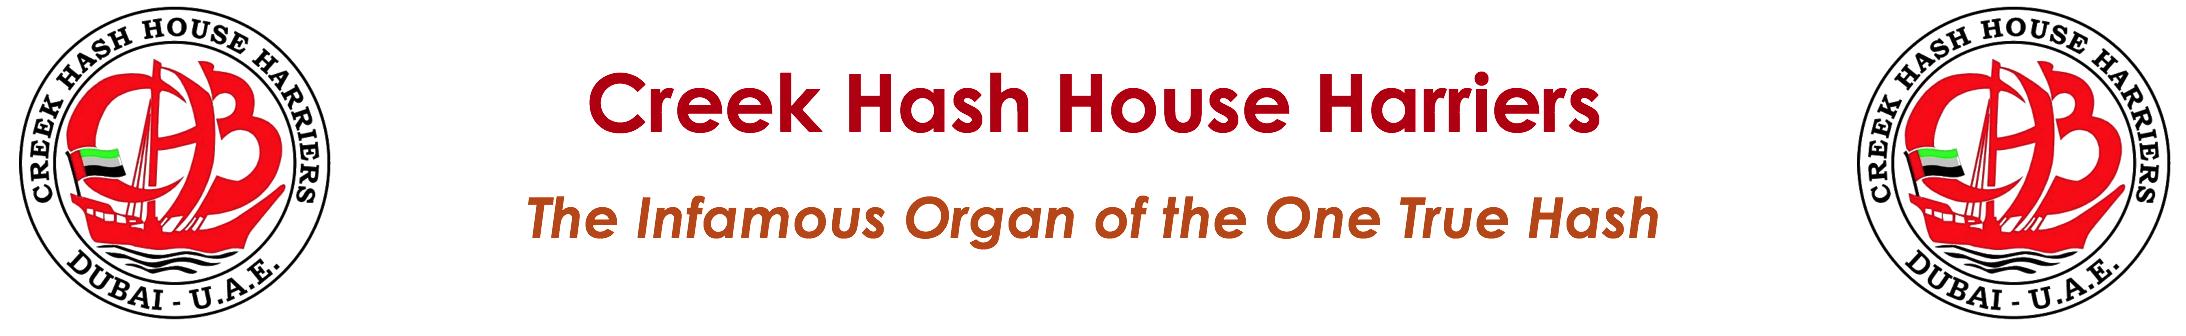 Creek Hash House Harriers (CH3) Logo